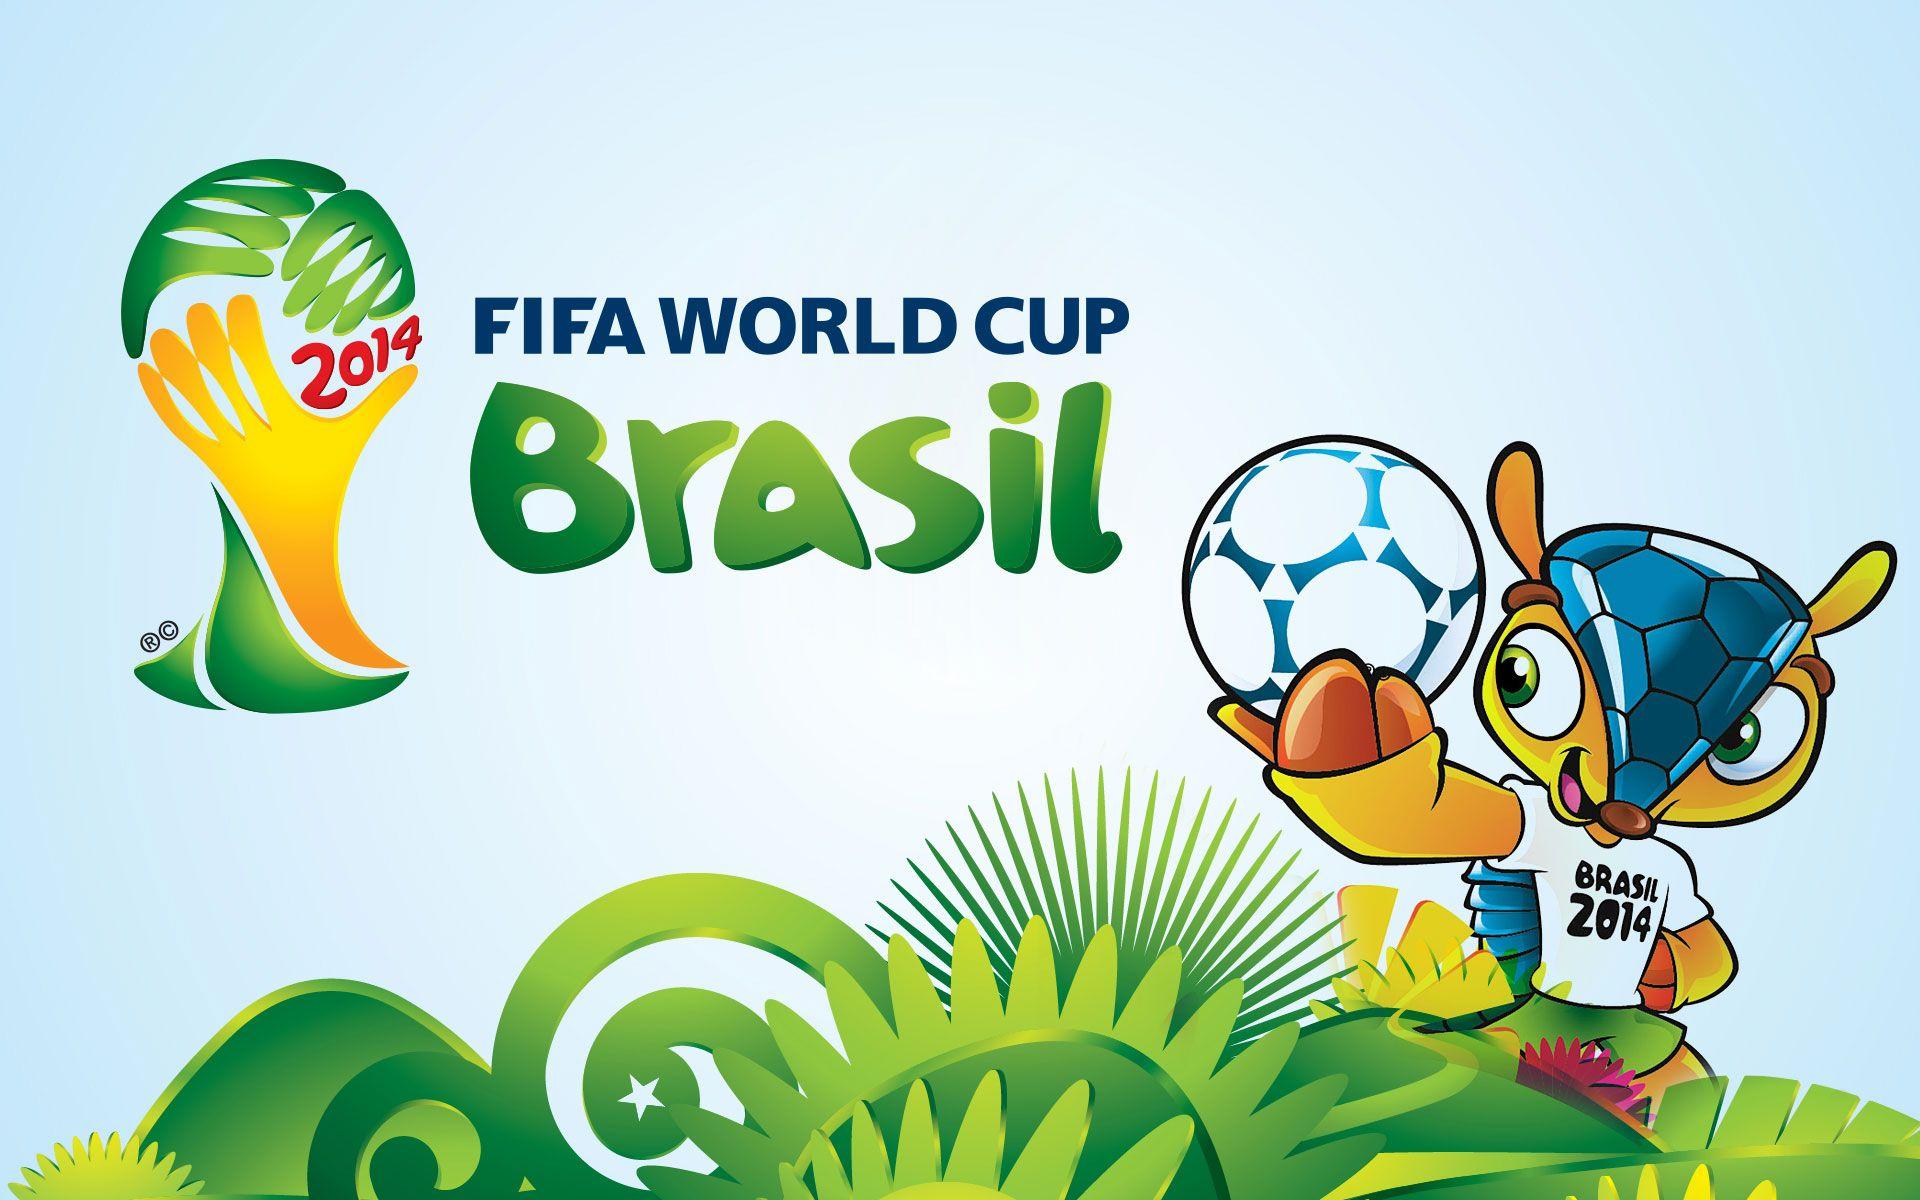 Fifa World Cup Brazil 2014 Hd Desktop Ipad Iphone Wallpapers World Cup 2014 Brazil World Cup Fifa World Cup